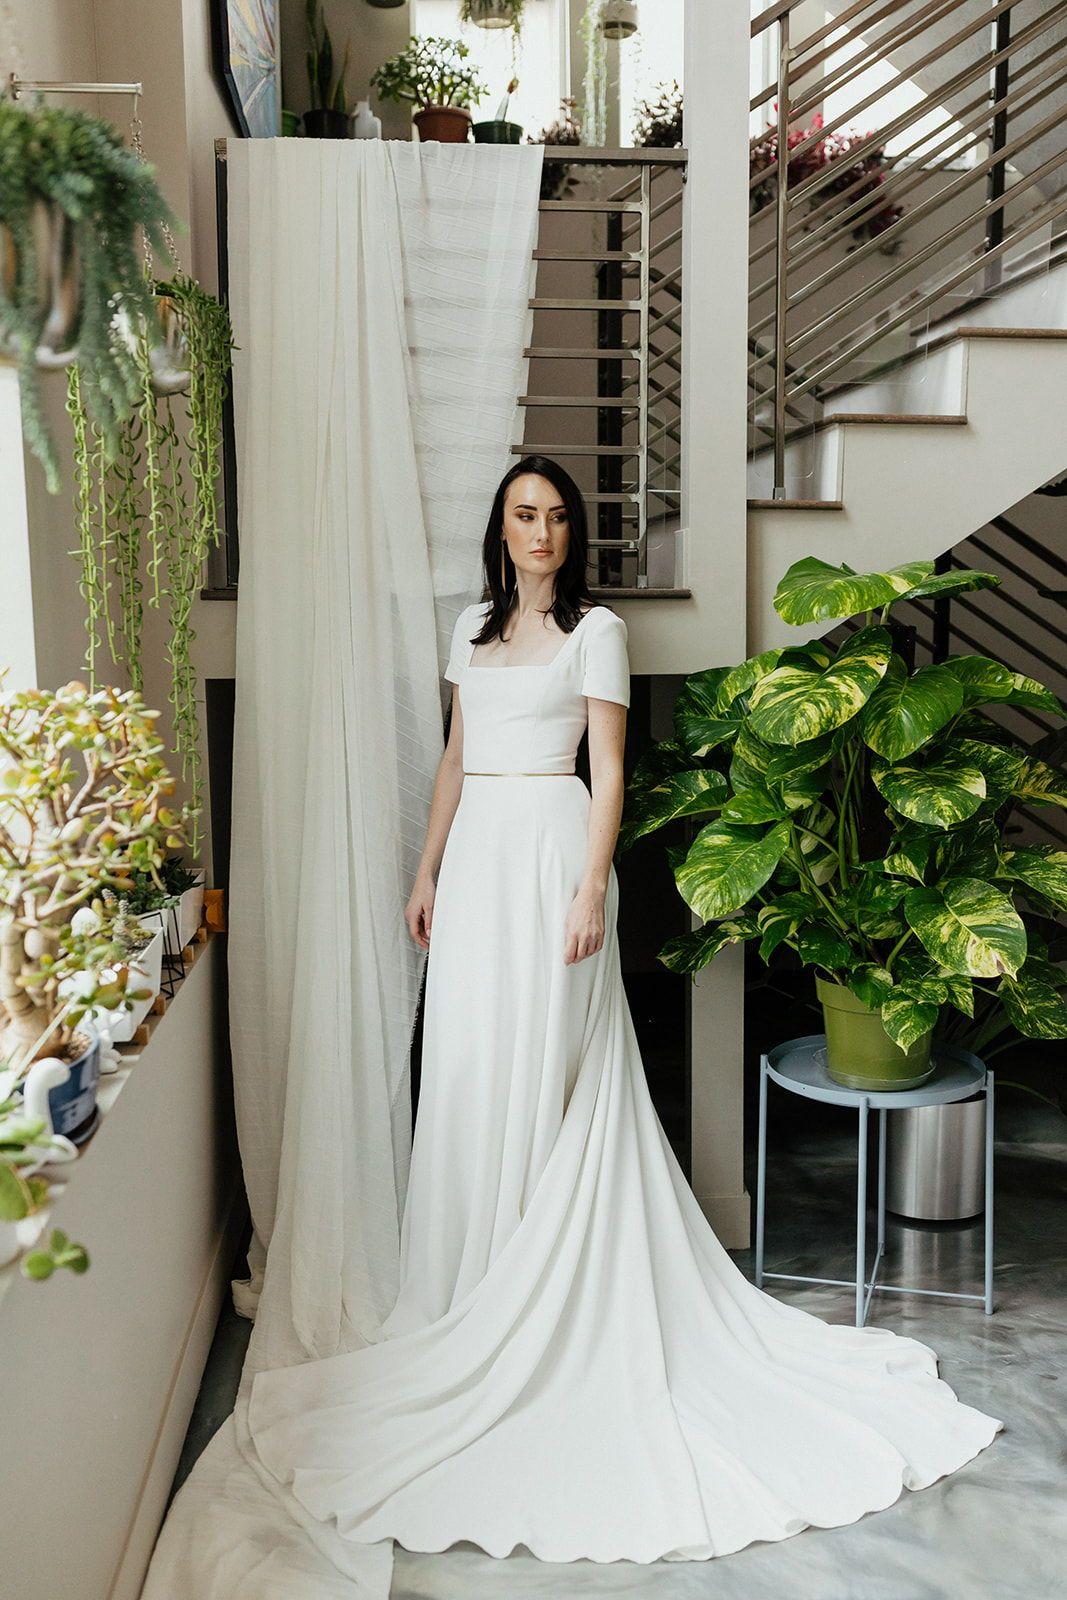 Modest Wedding Dresses In 2020 Modest Wedding Dresses Modest Bridal Gowns Short Sleeve Wedding Dress